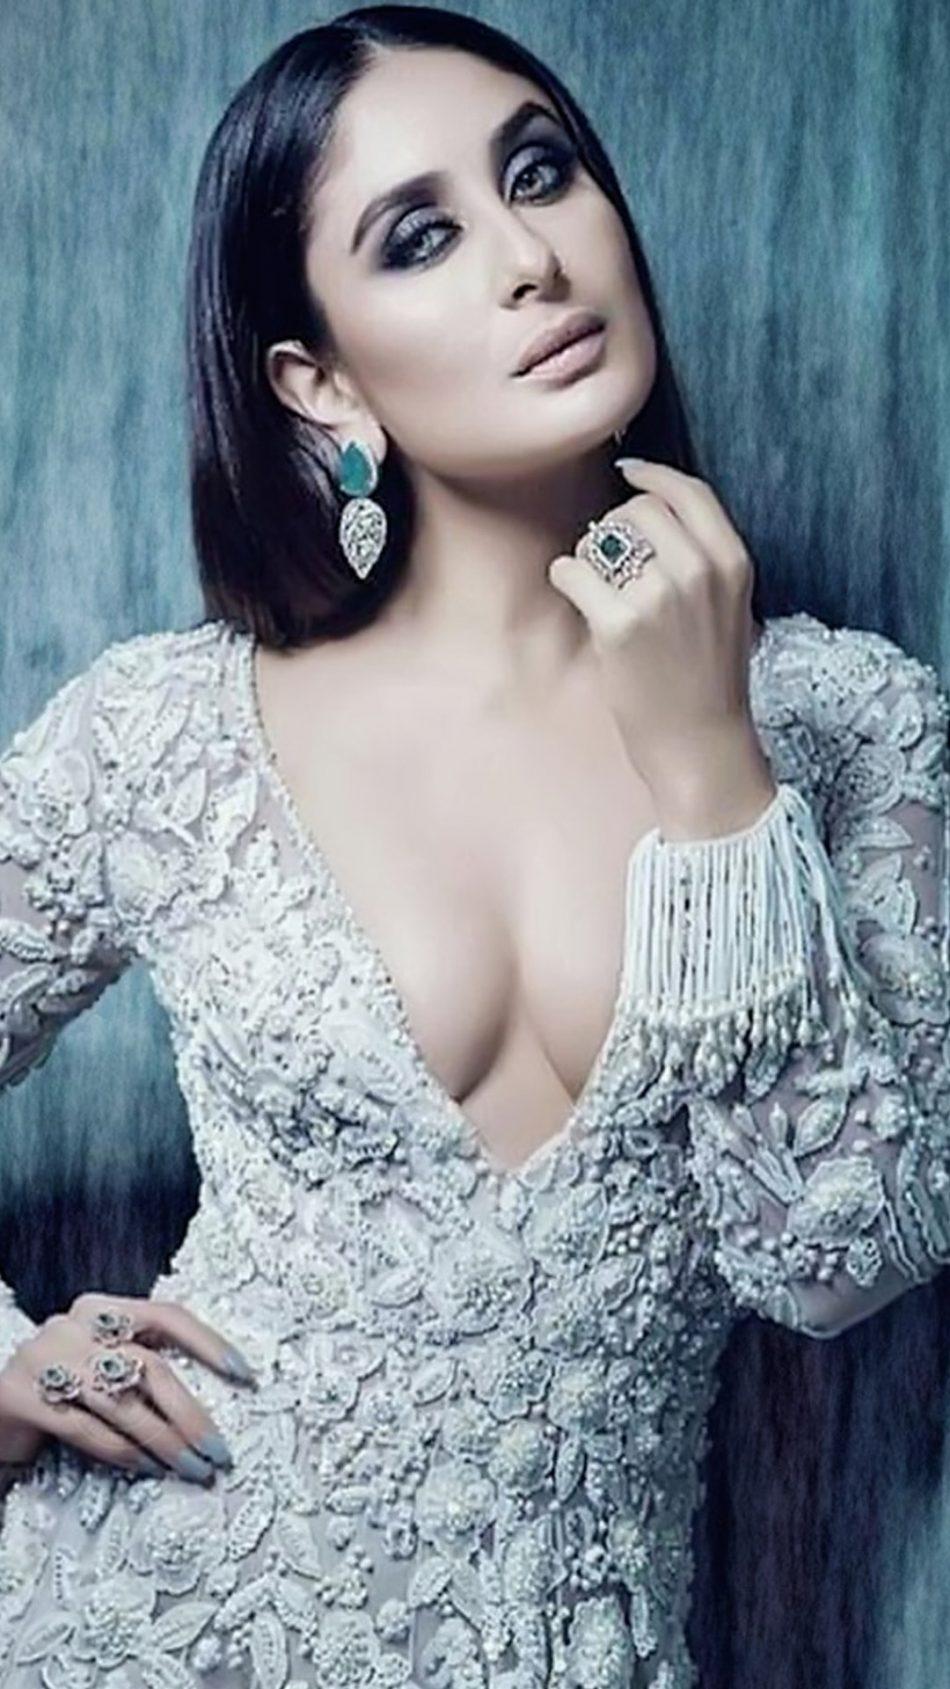 kareena kapoor hot photoshoot - download free 100% pure hd quality